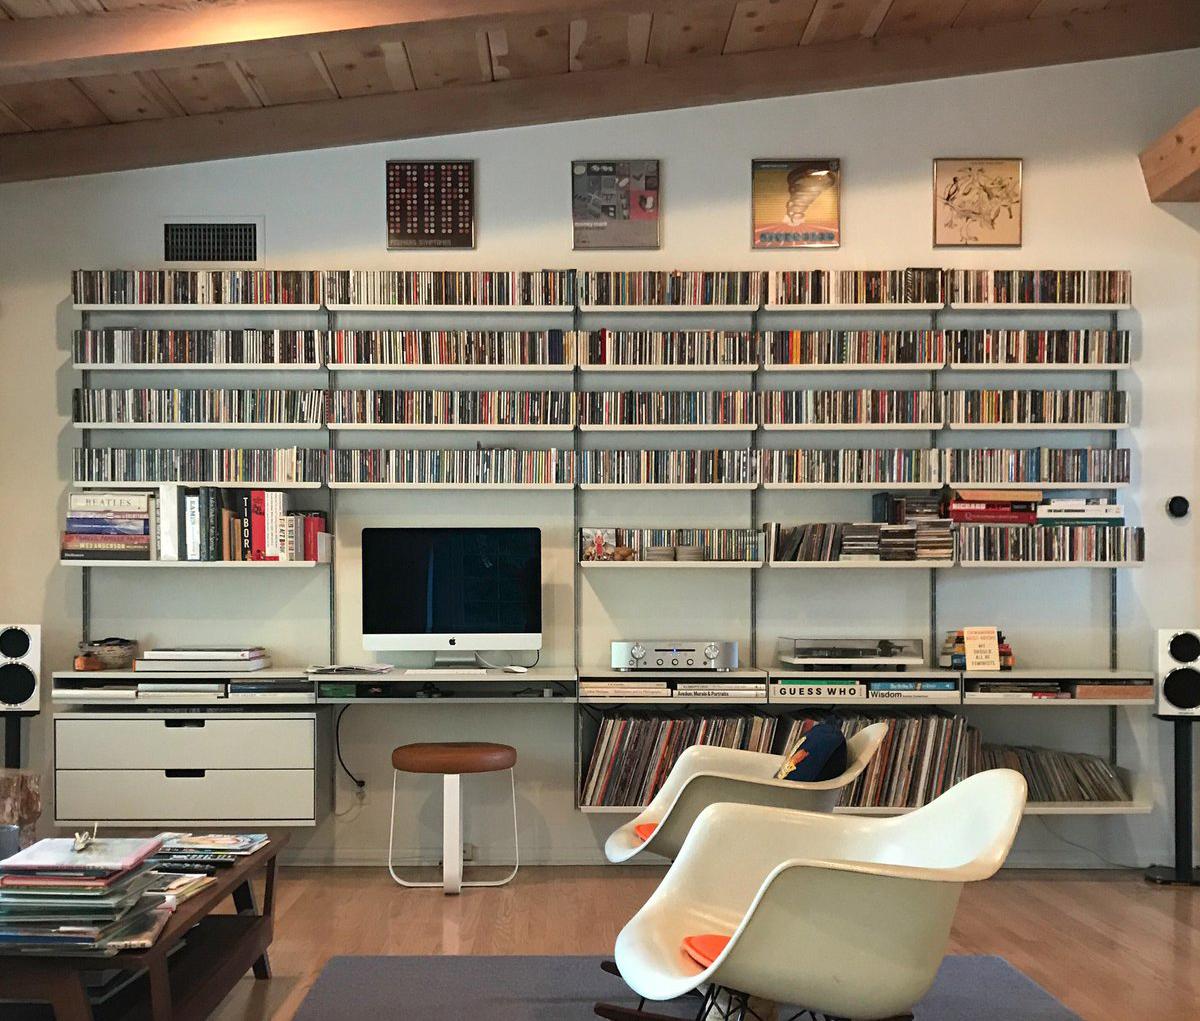 Libros imprescindibles sobre música electrónica, ¿conoces todos?